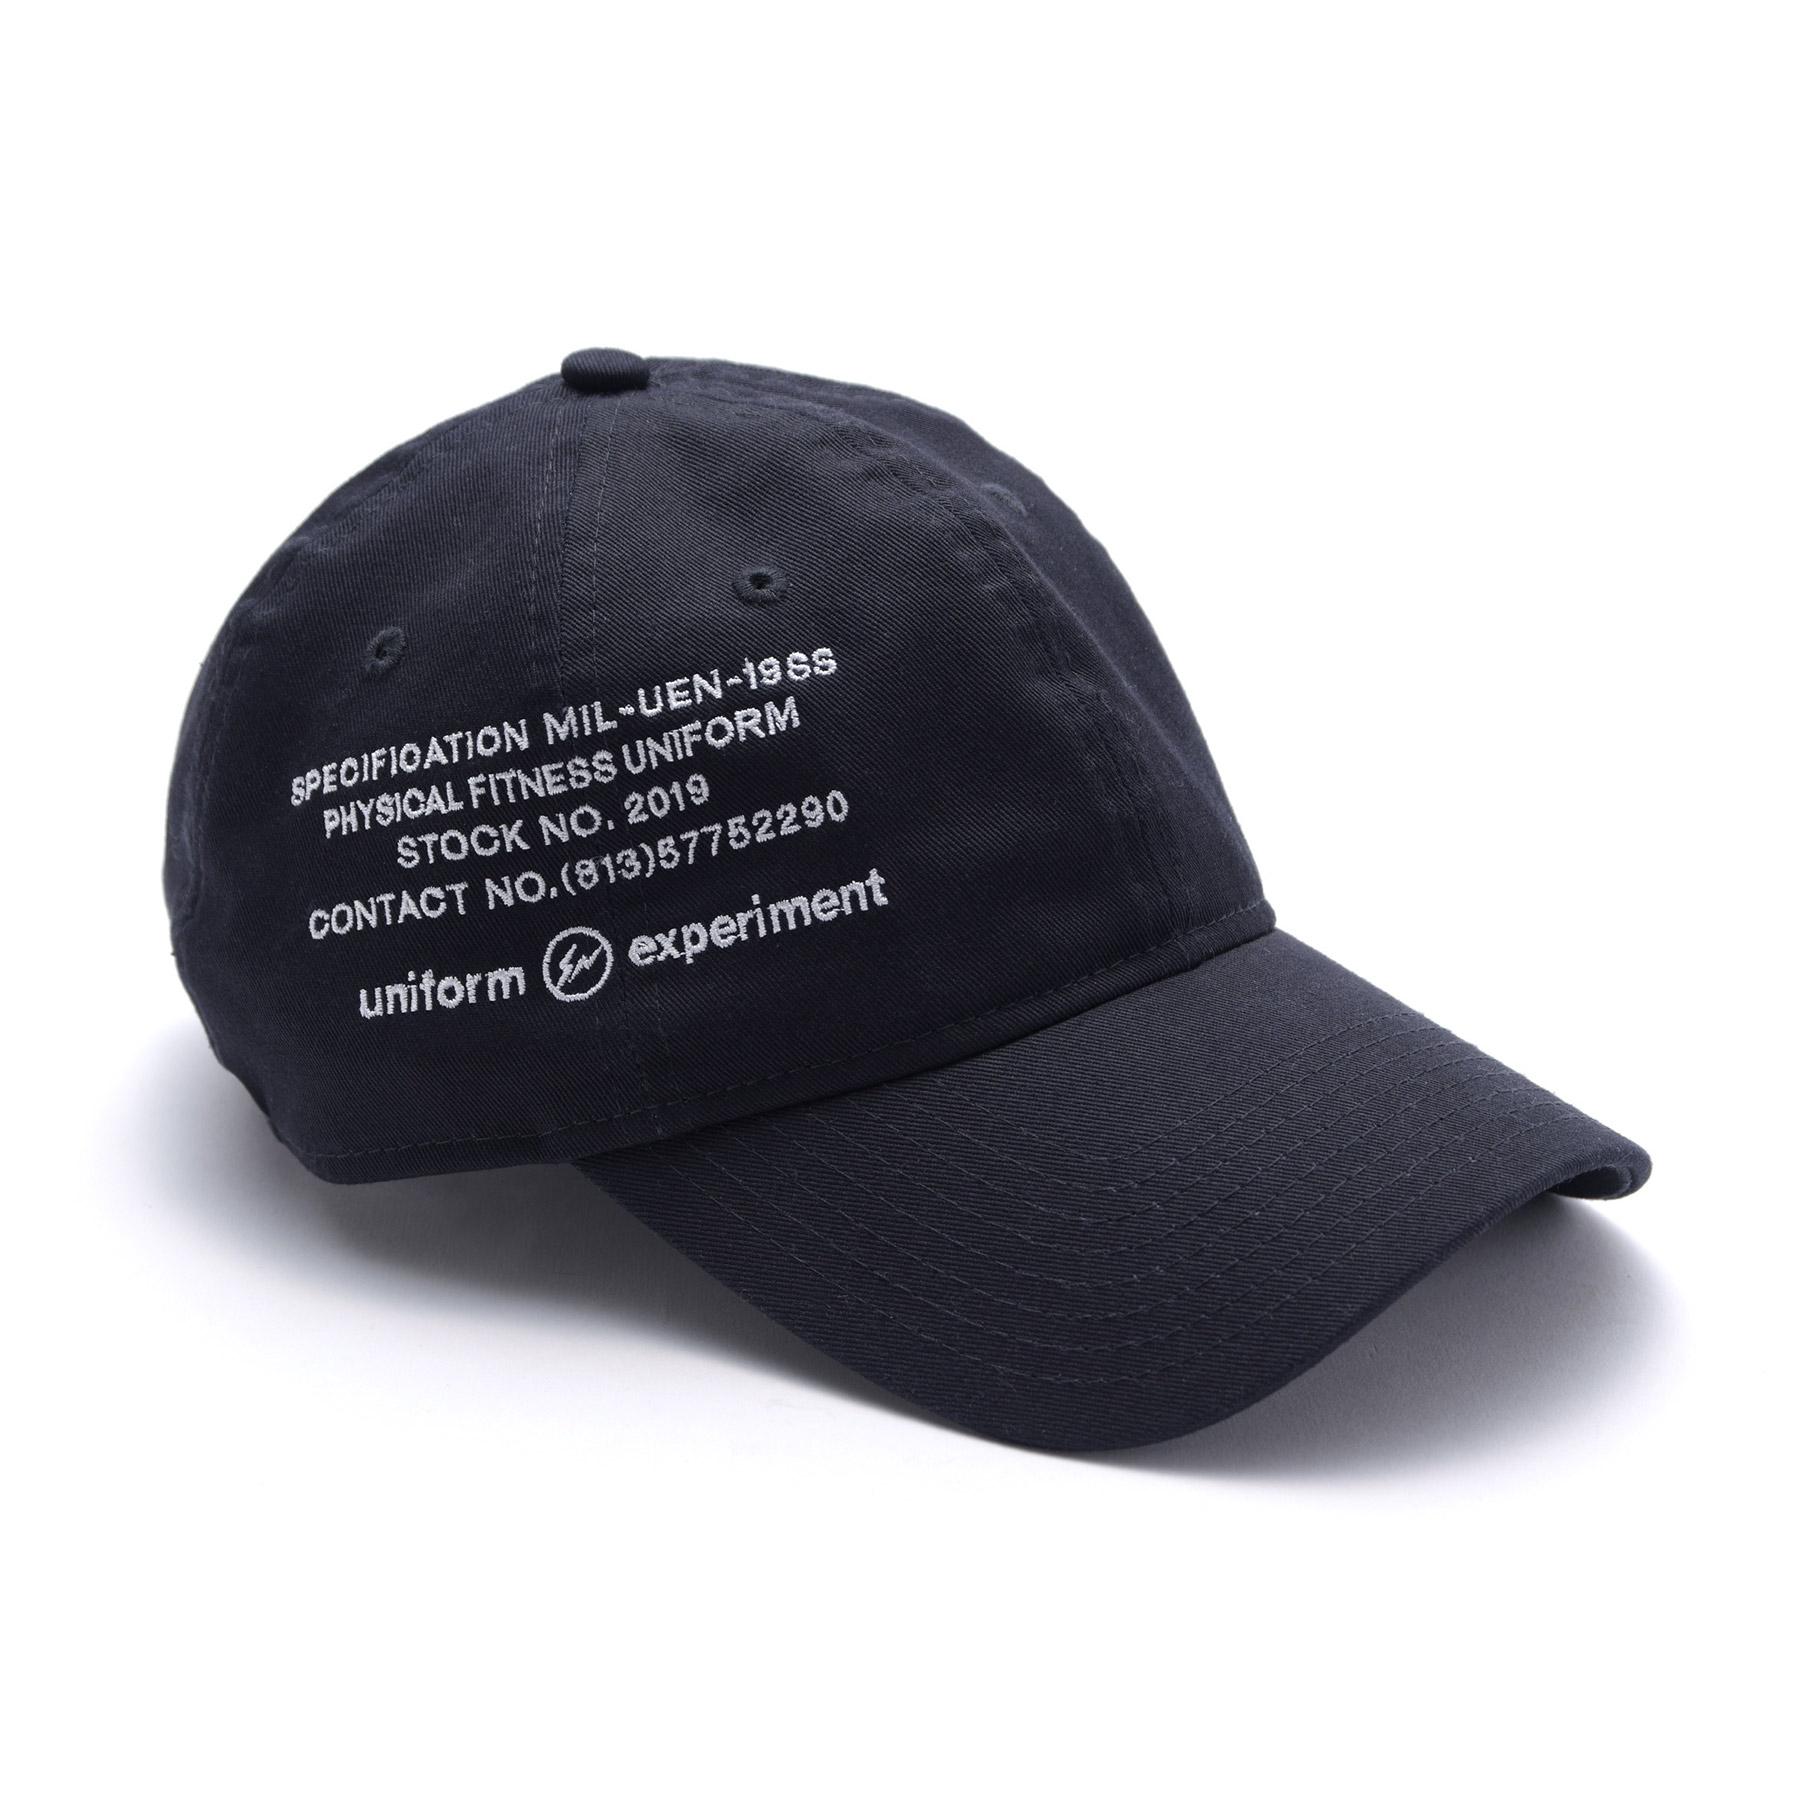 uniform experiment / NEW ERA 9TWENTY UEN CAP -Navy